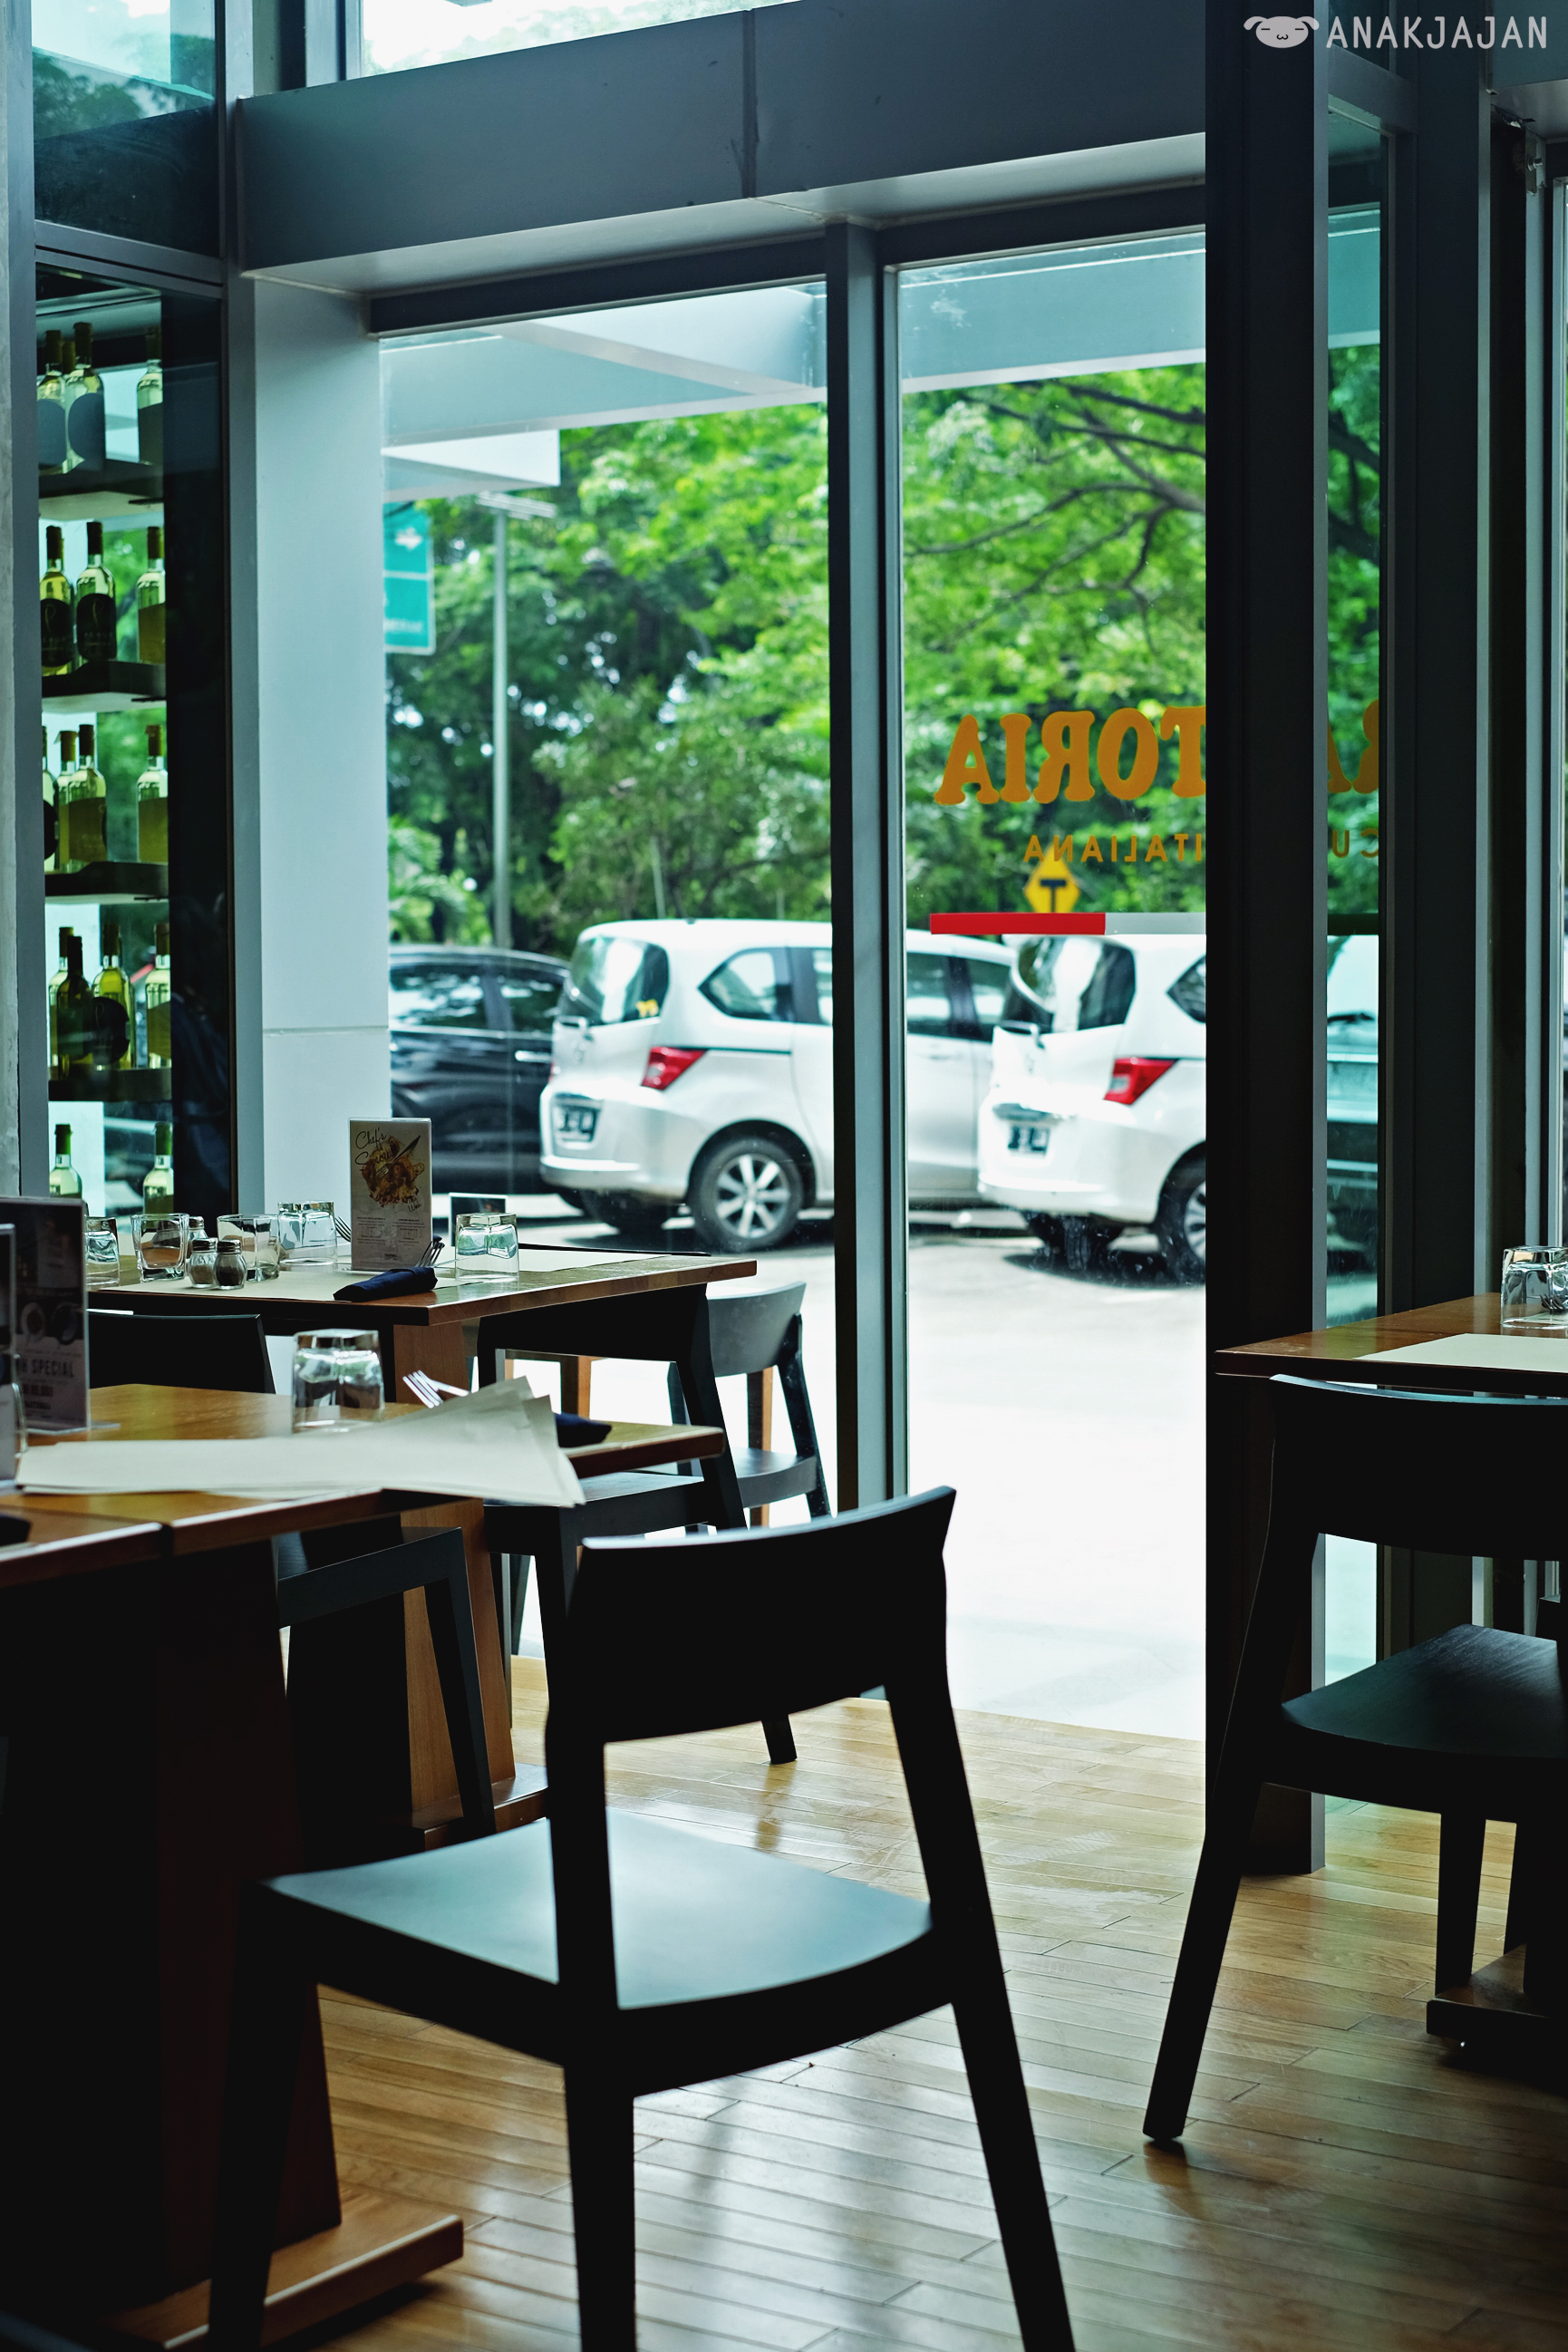 Trattoria cucina italiana st moritz lippo mall puri for Cucina italiana